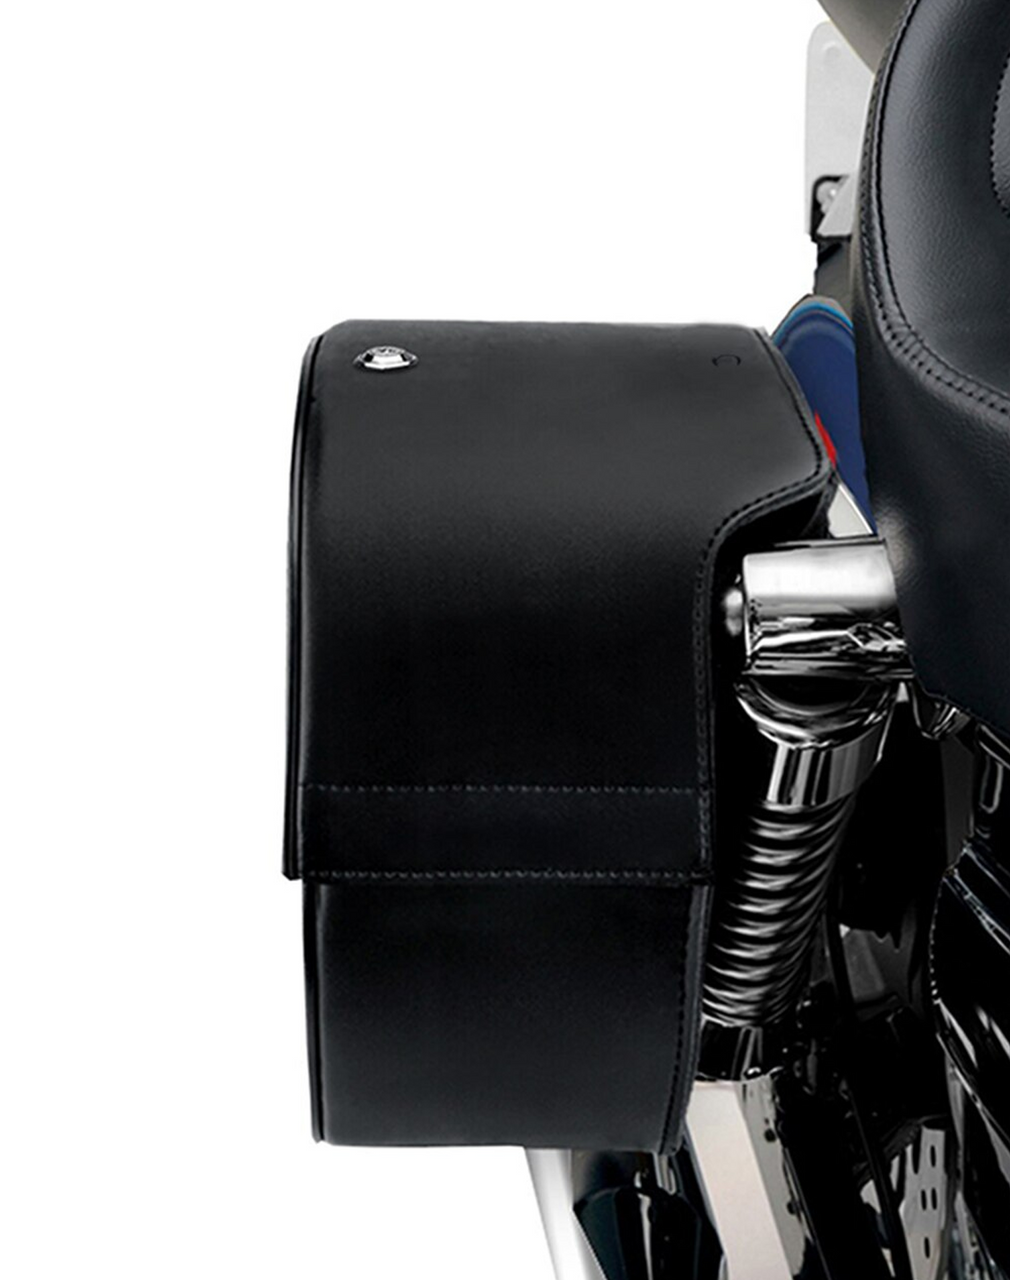 Viking Single Strap Large Shock Cutout Slanted Motorcycle Saddlebags For Harley Sportster Iron 1200 Shock cutout veiw